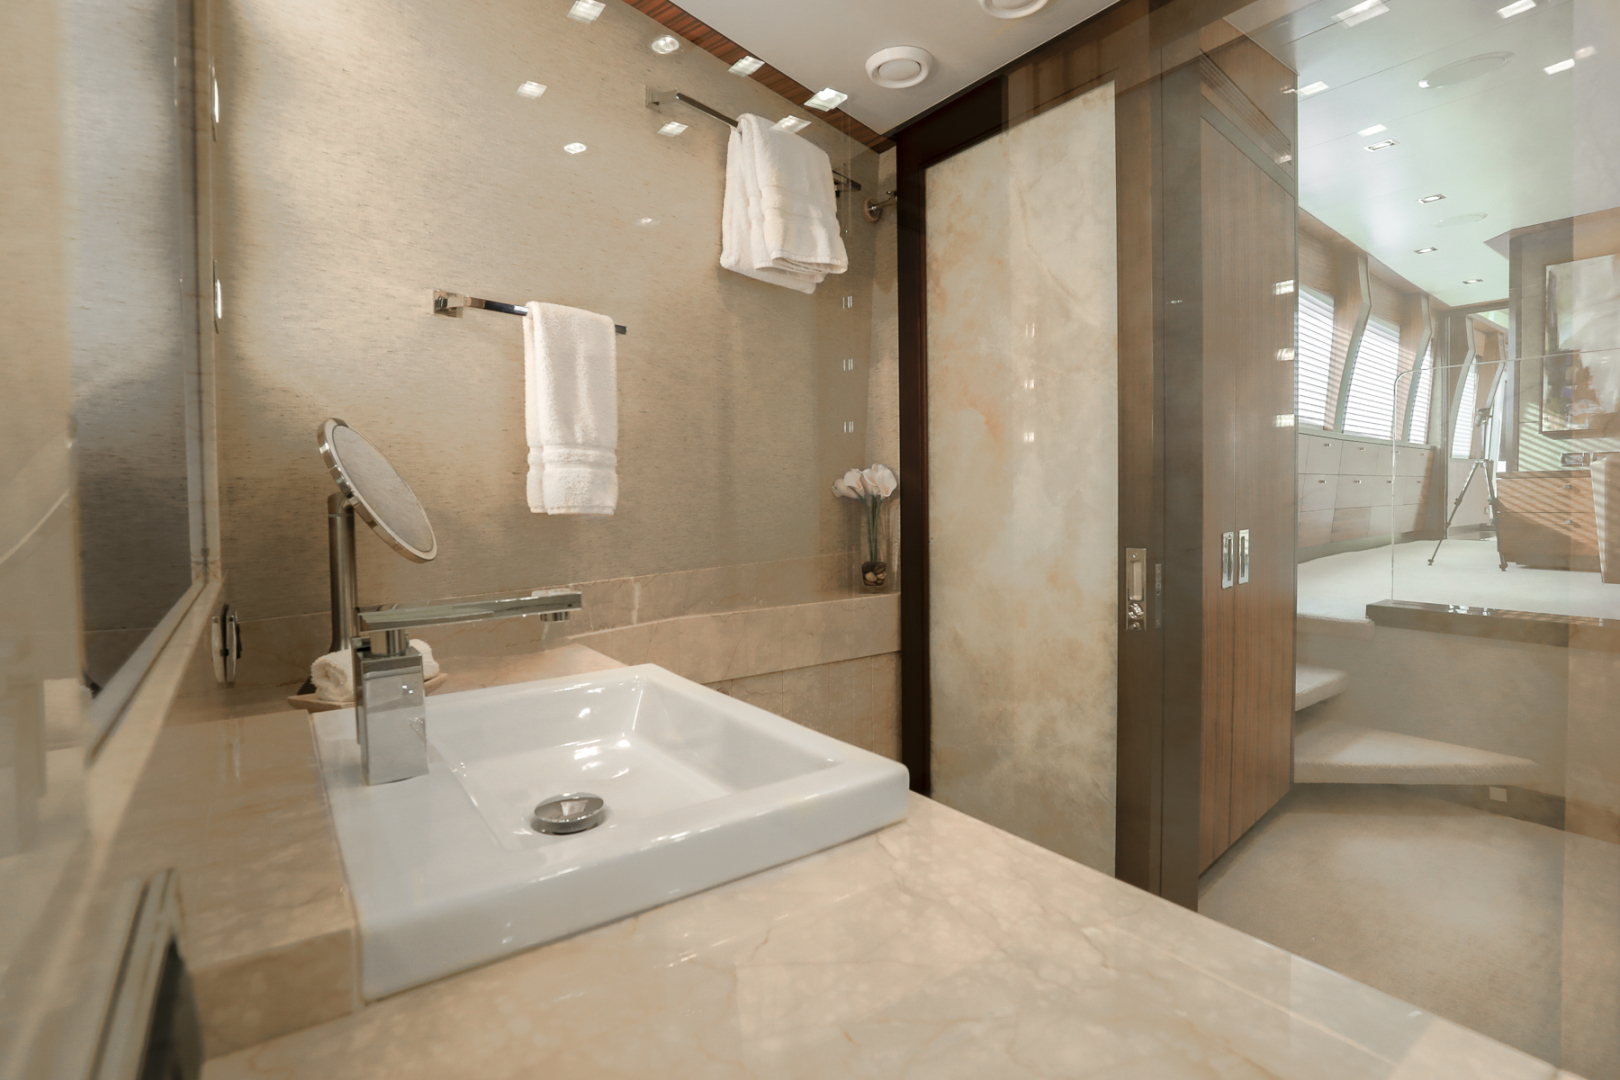 Northcoast-NC125 2011-FUGITIVE *Name Reserved* West Palm Beach-Florida-United States-Master Bath-1513462 | Thumbnail